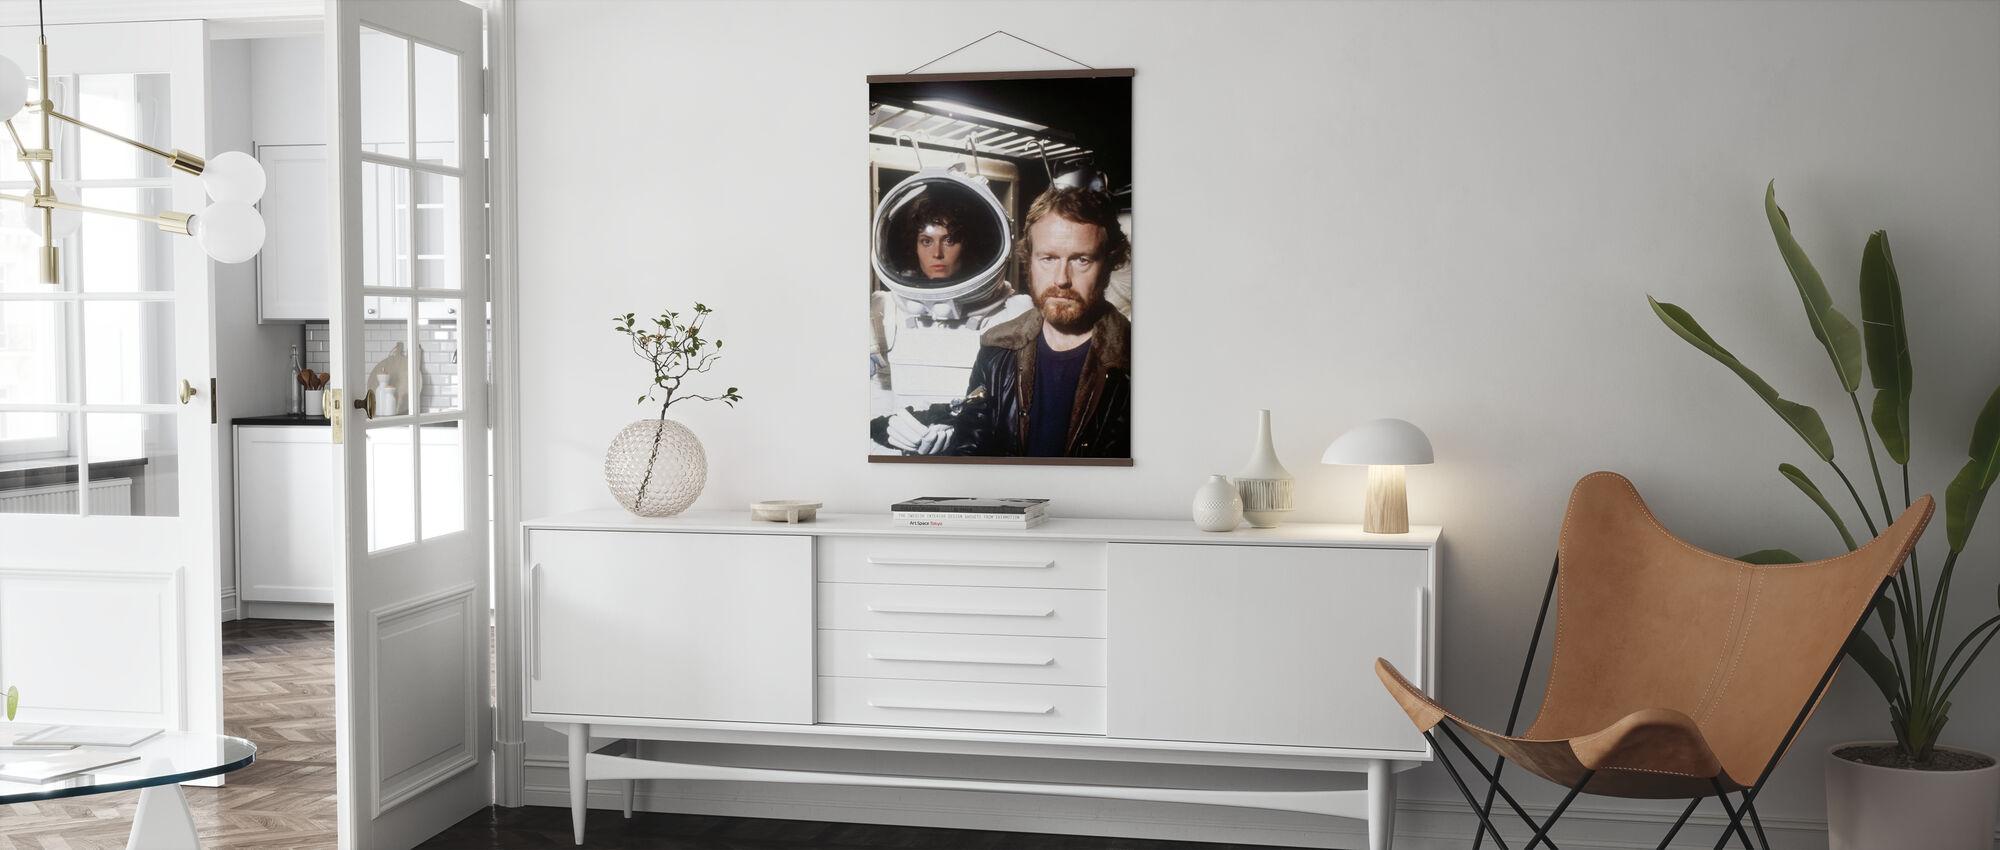 Alien ruimtepak - sigourney weaver en ridley scott - Poster - Woonkamer